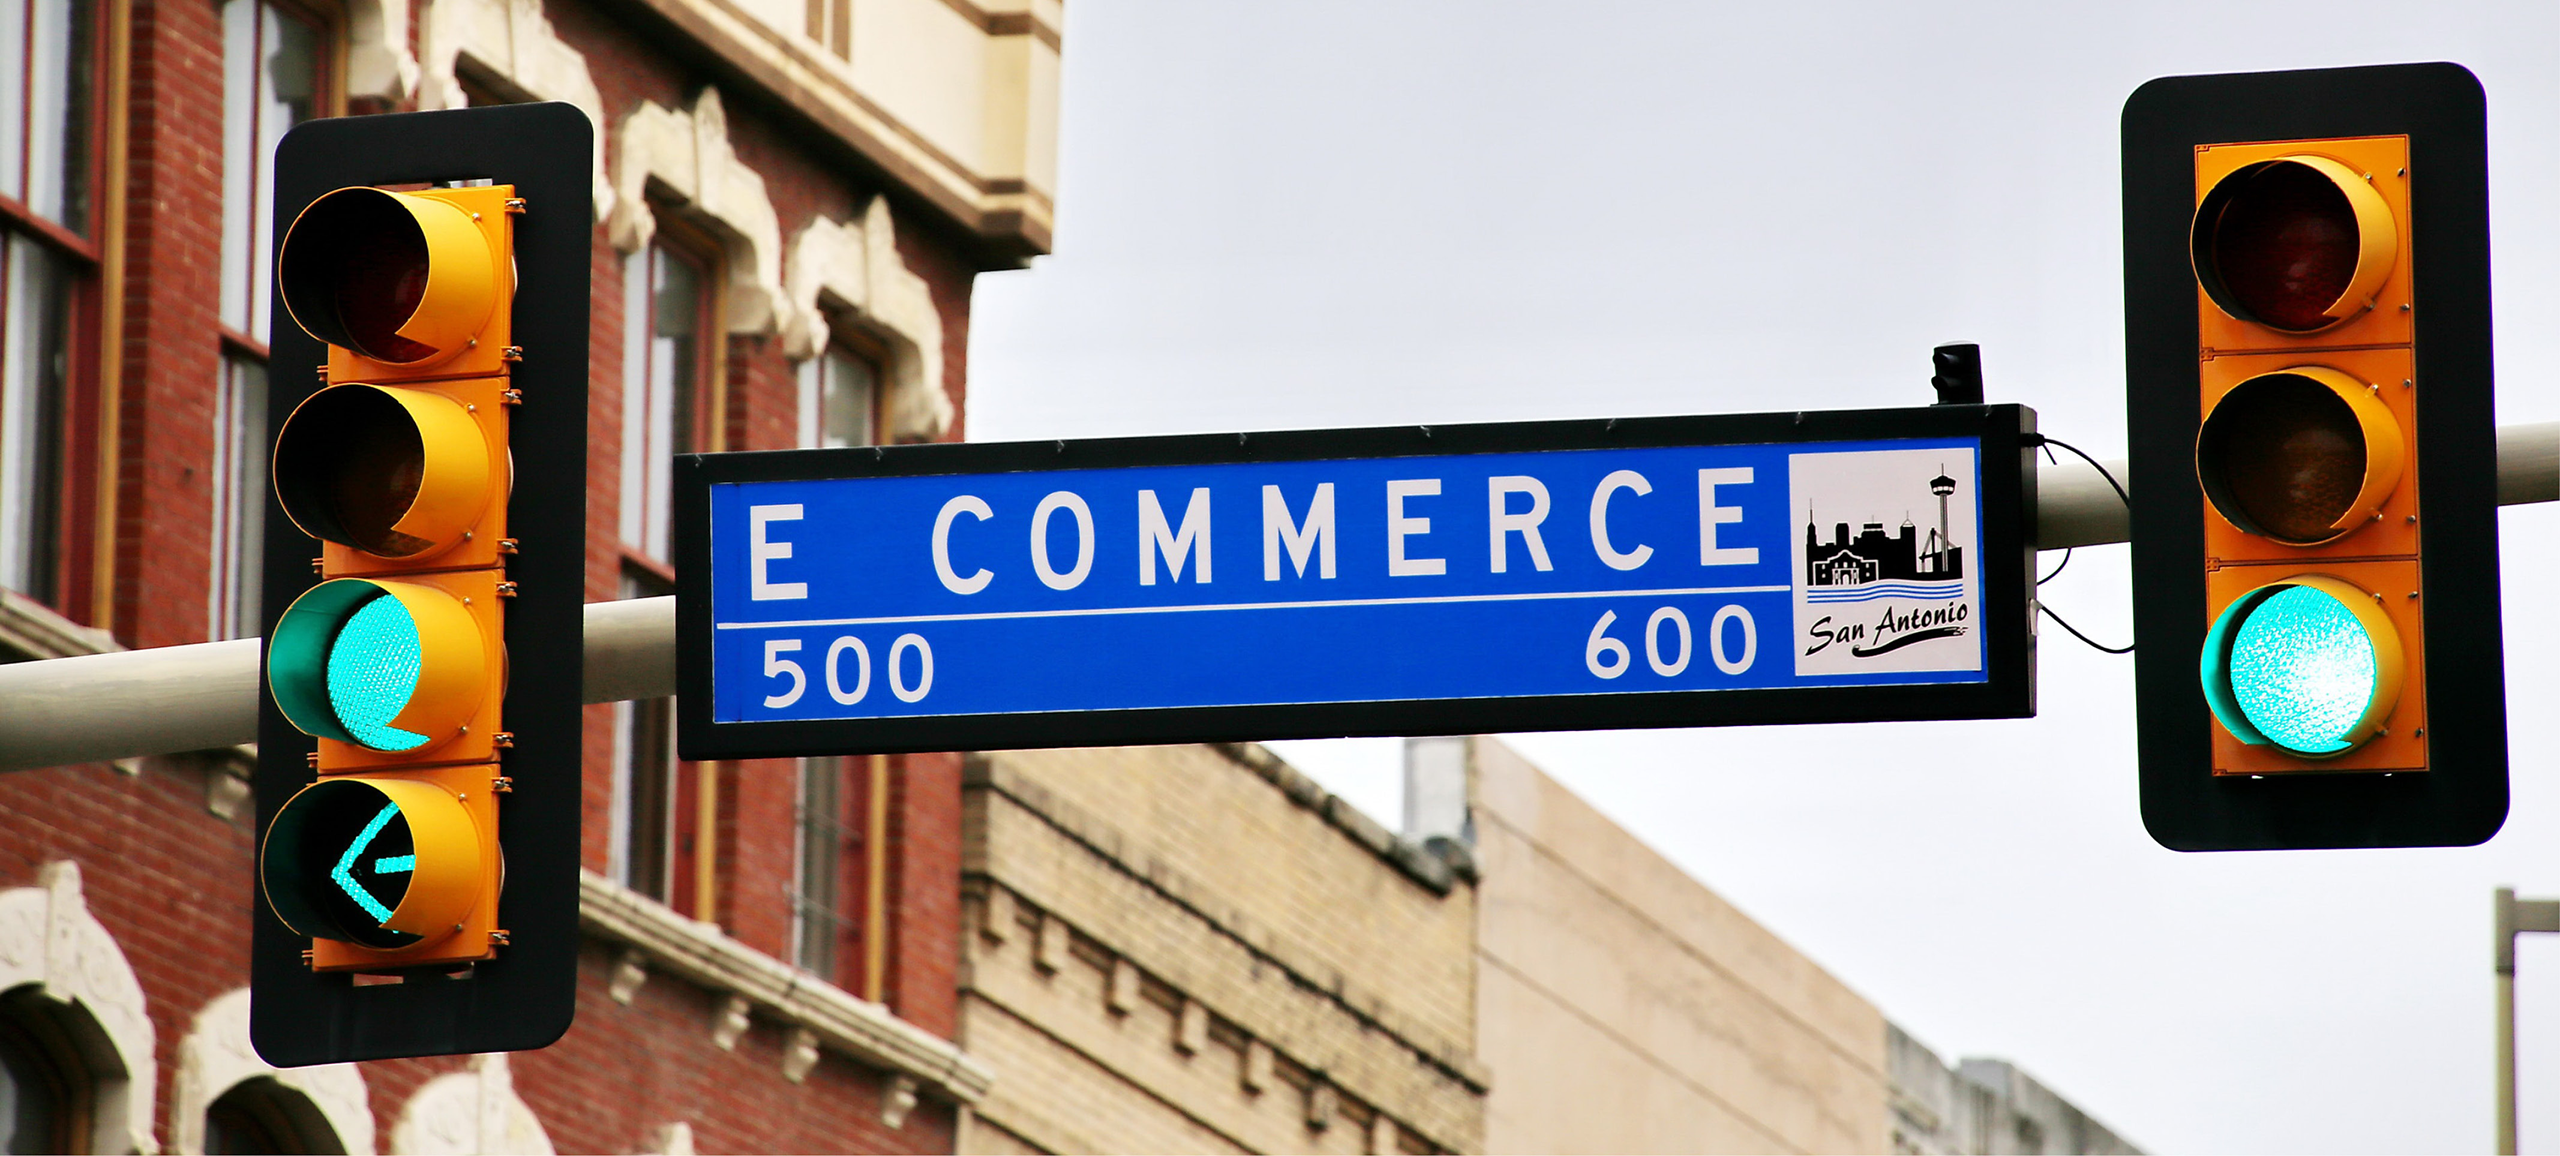 E-Commerce und die fehlende Haptik